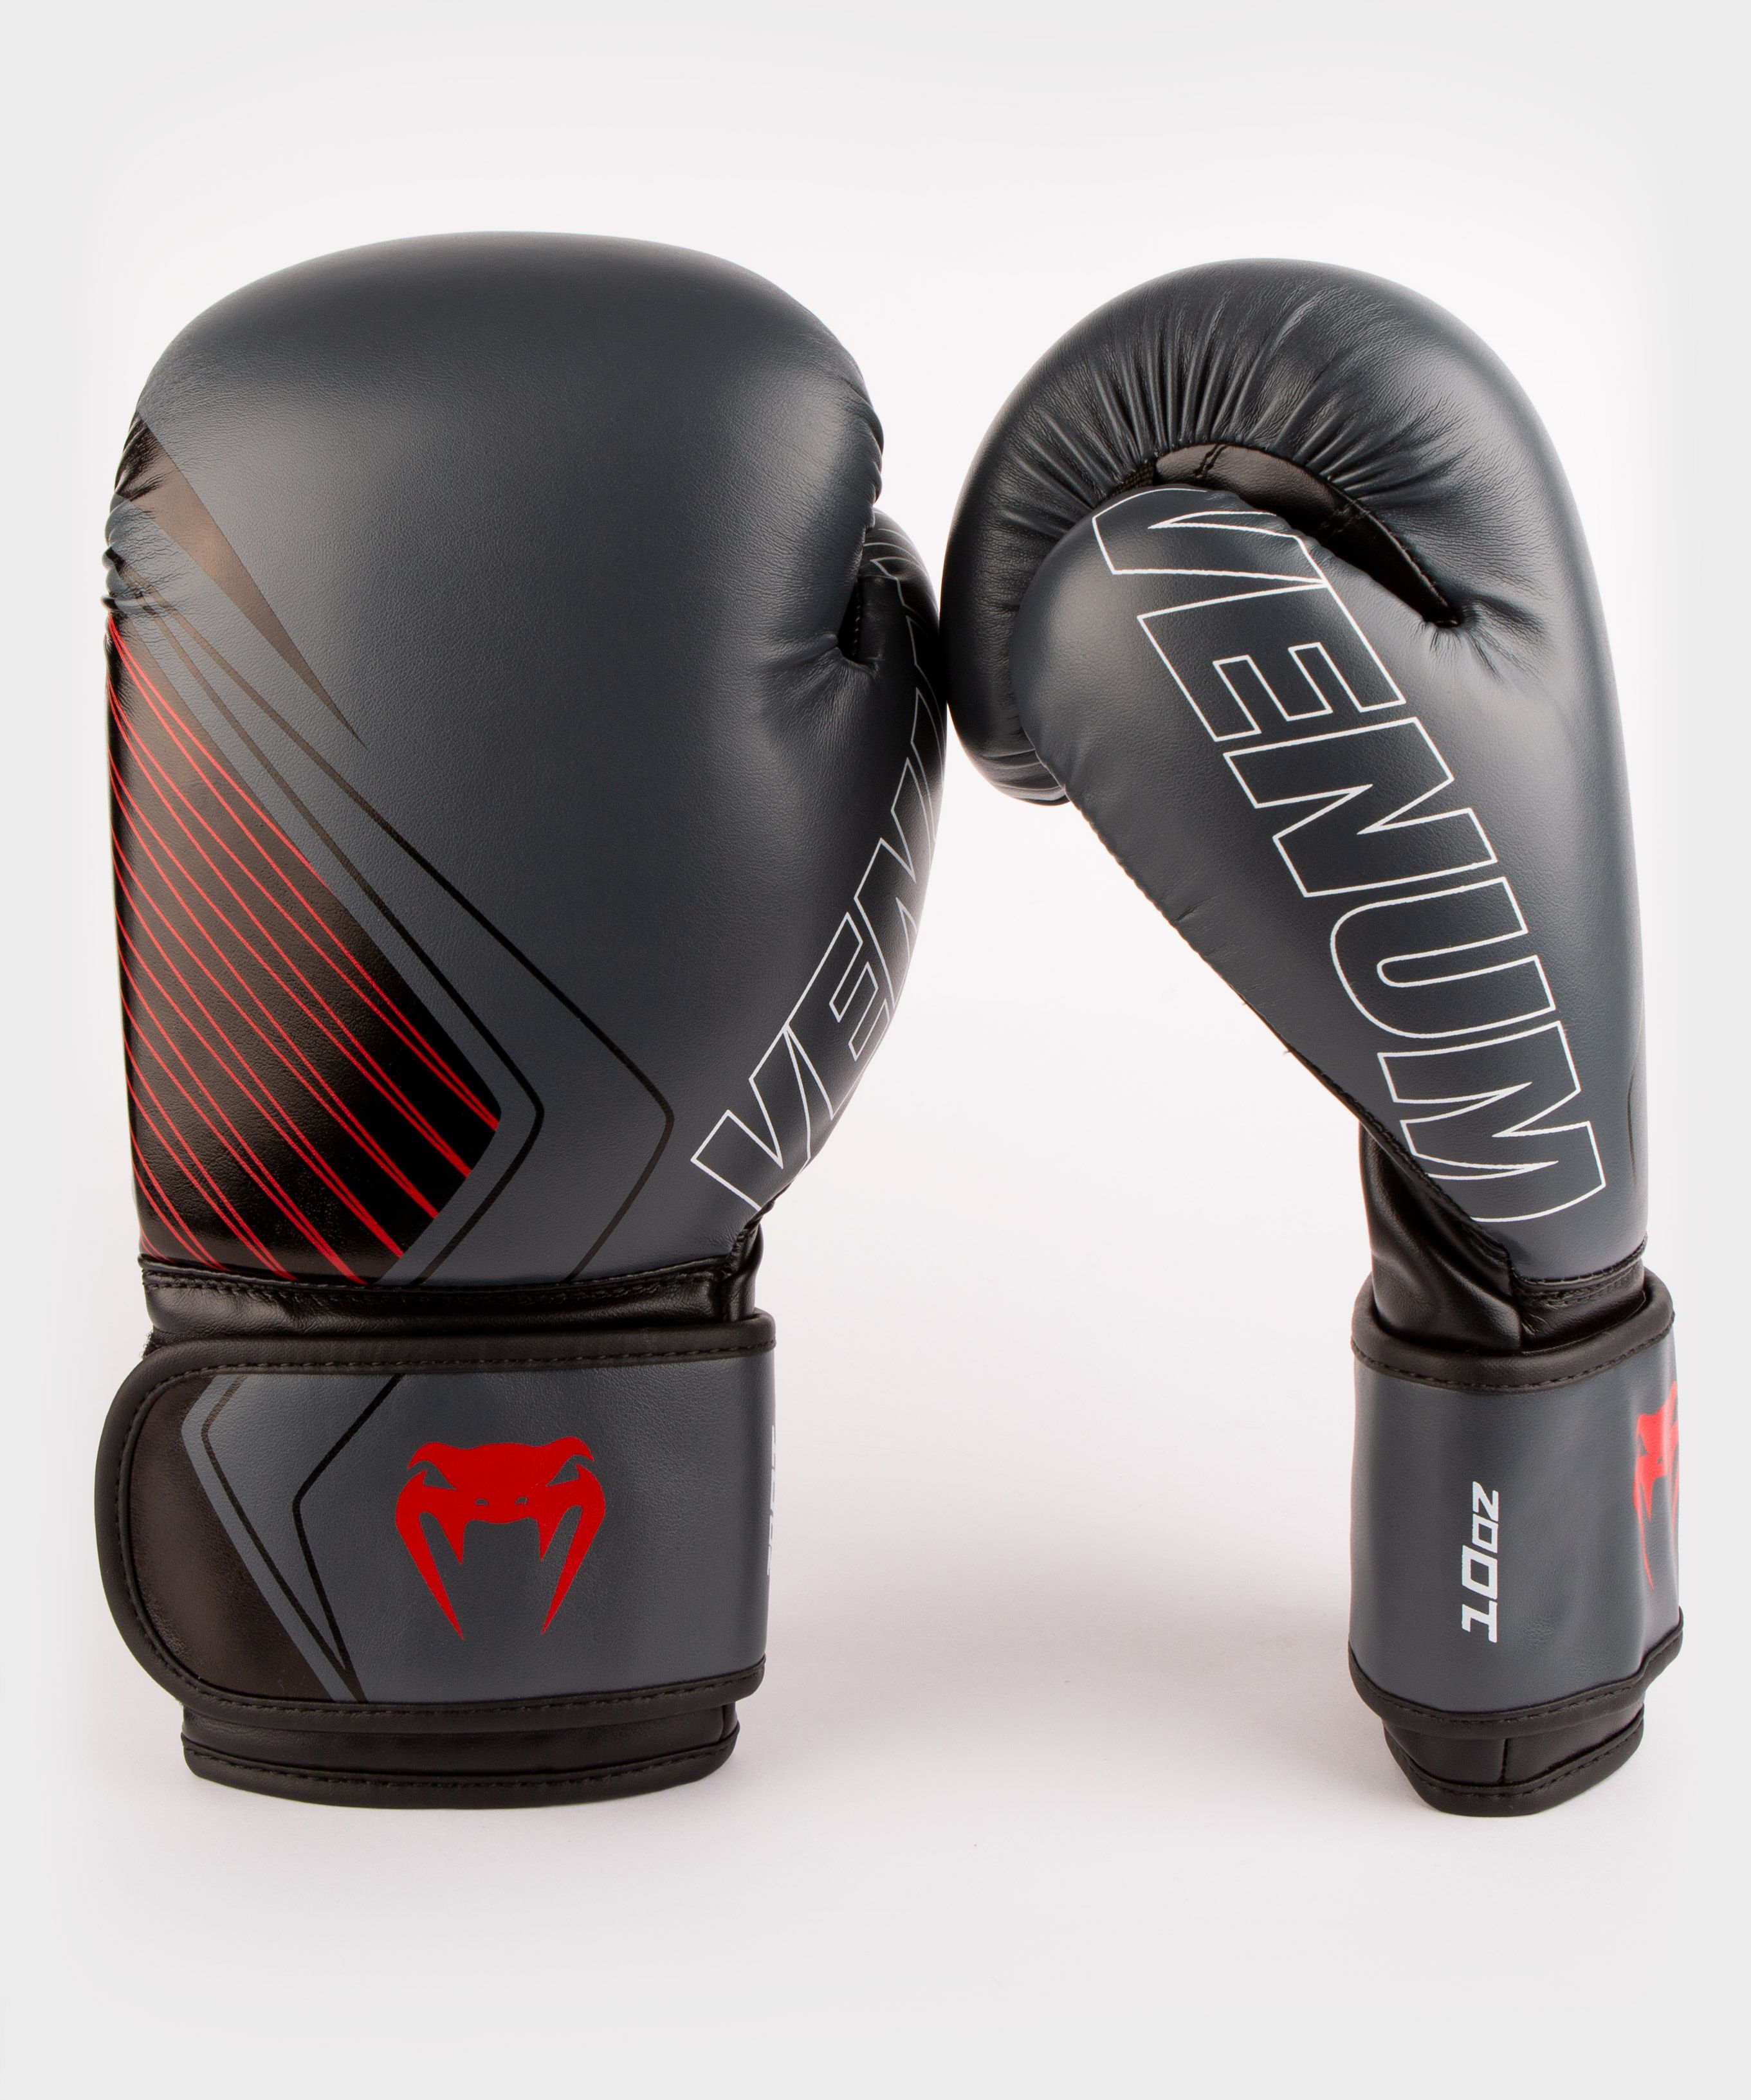 Venum Contender 2.0 Gloves - Black/Red